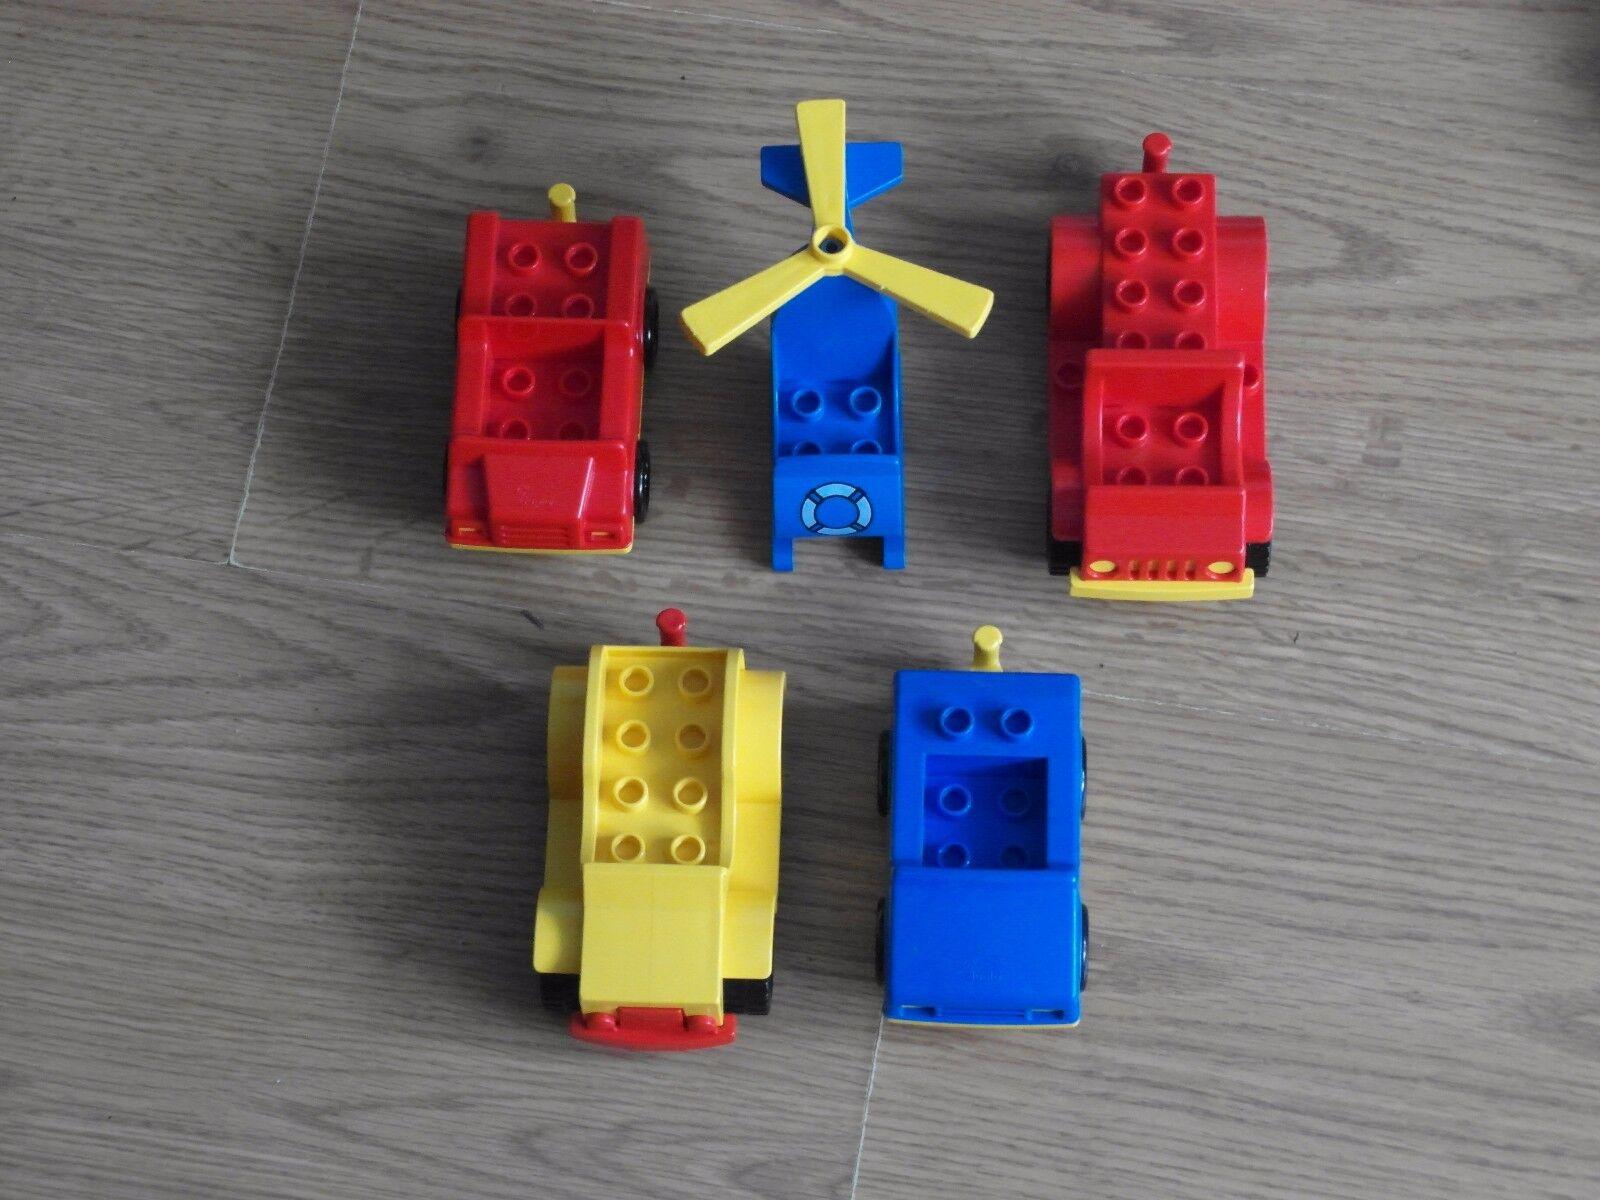 Lego duplo - - 5 gmt25 fahrzeuge - gmt25 5 371920